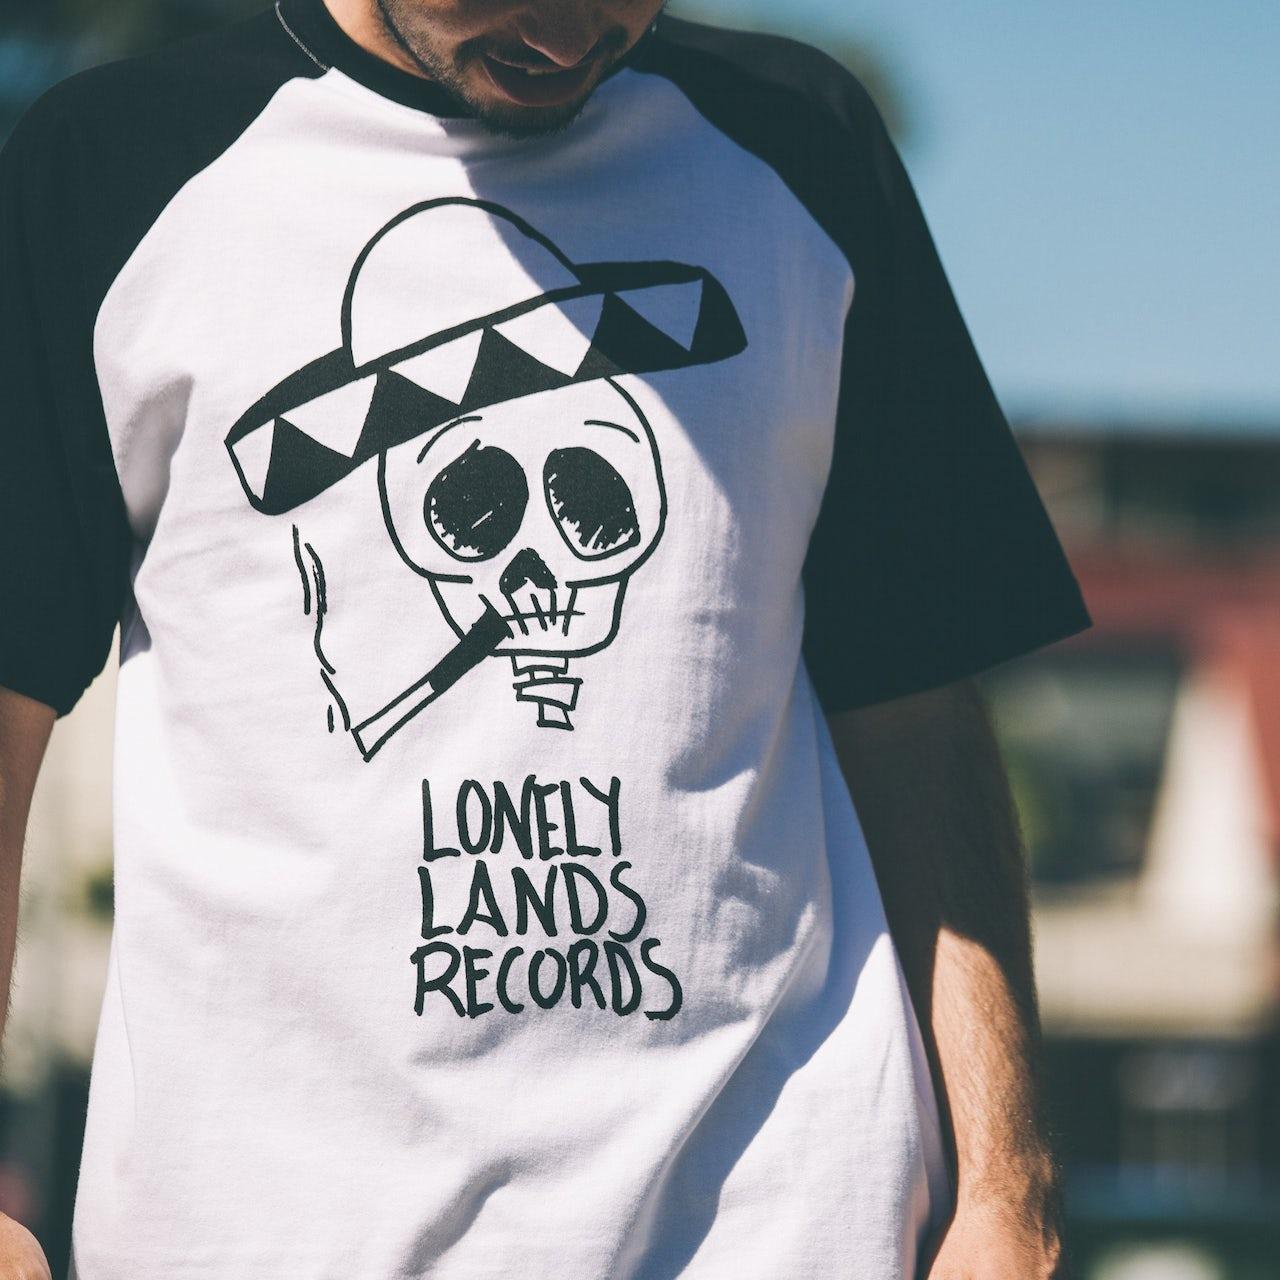 Tash Sultana Lonely Lands Records Raglan (White/Black)